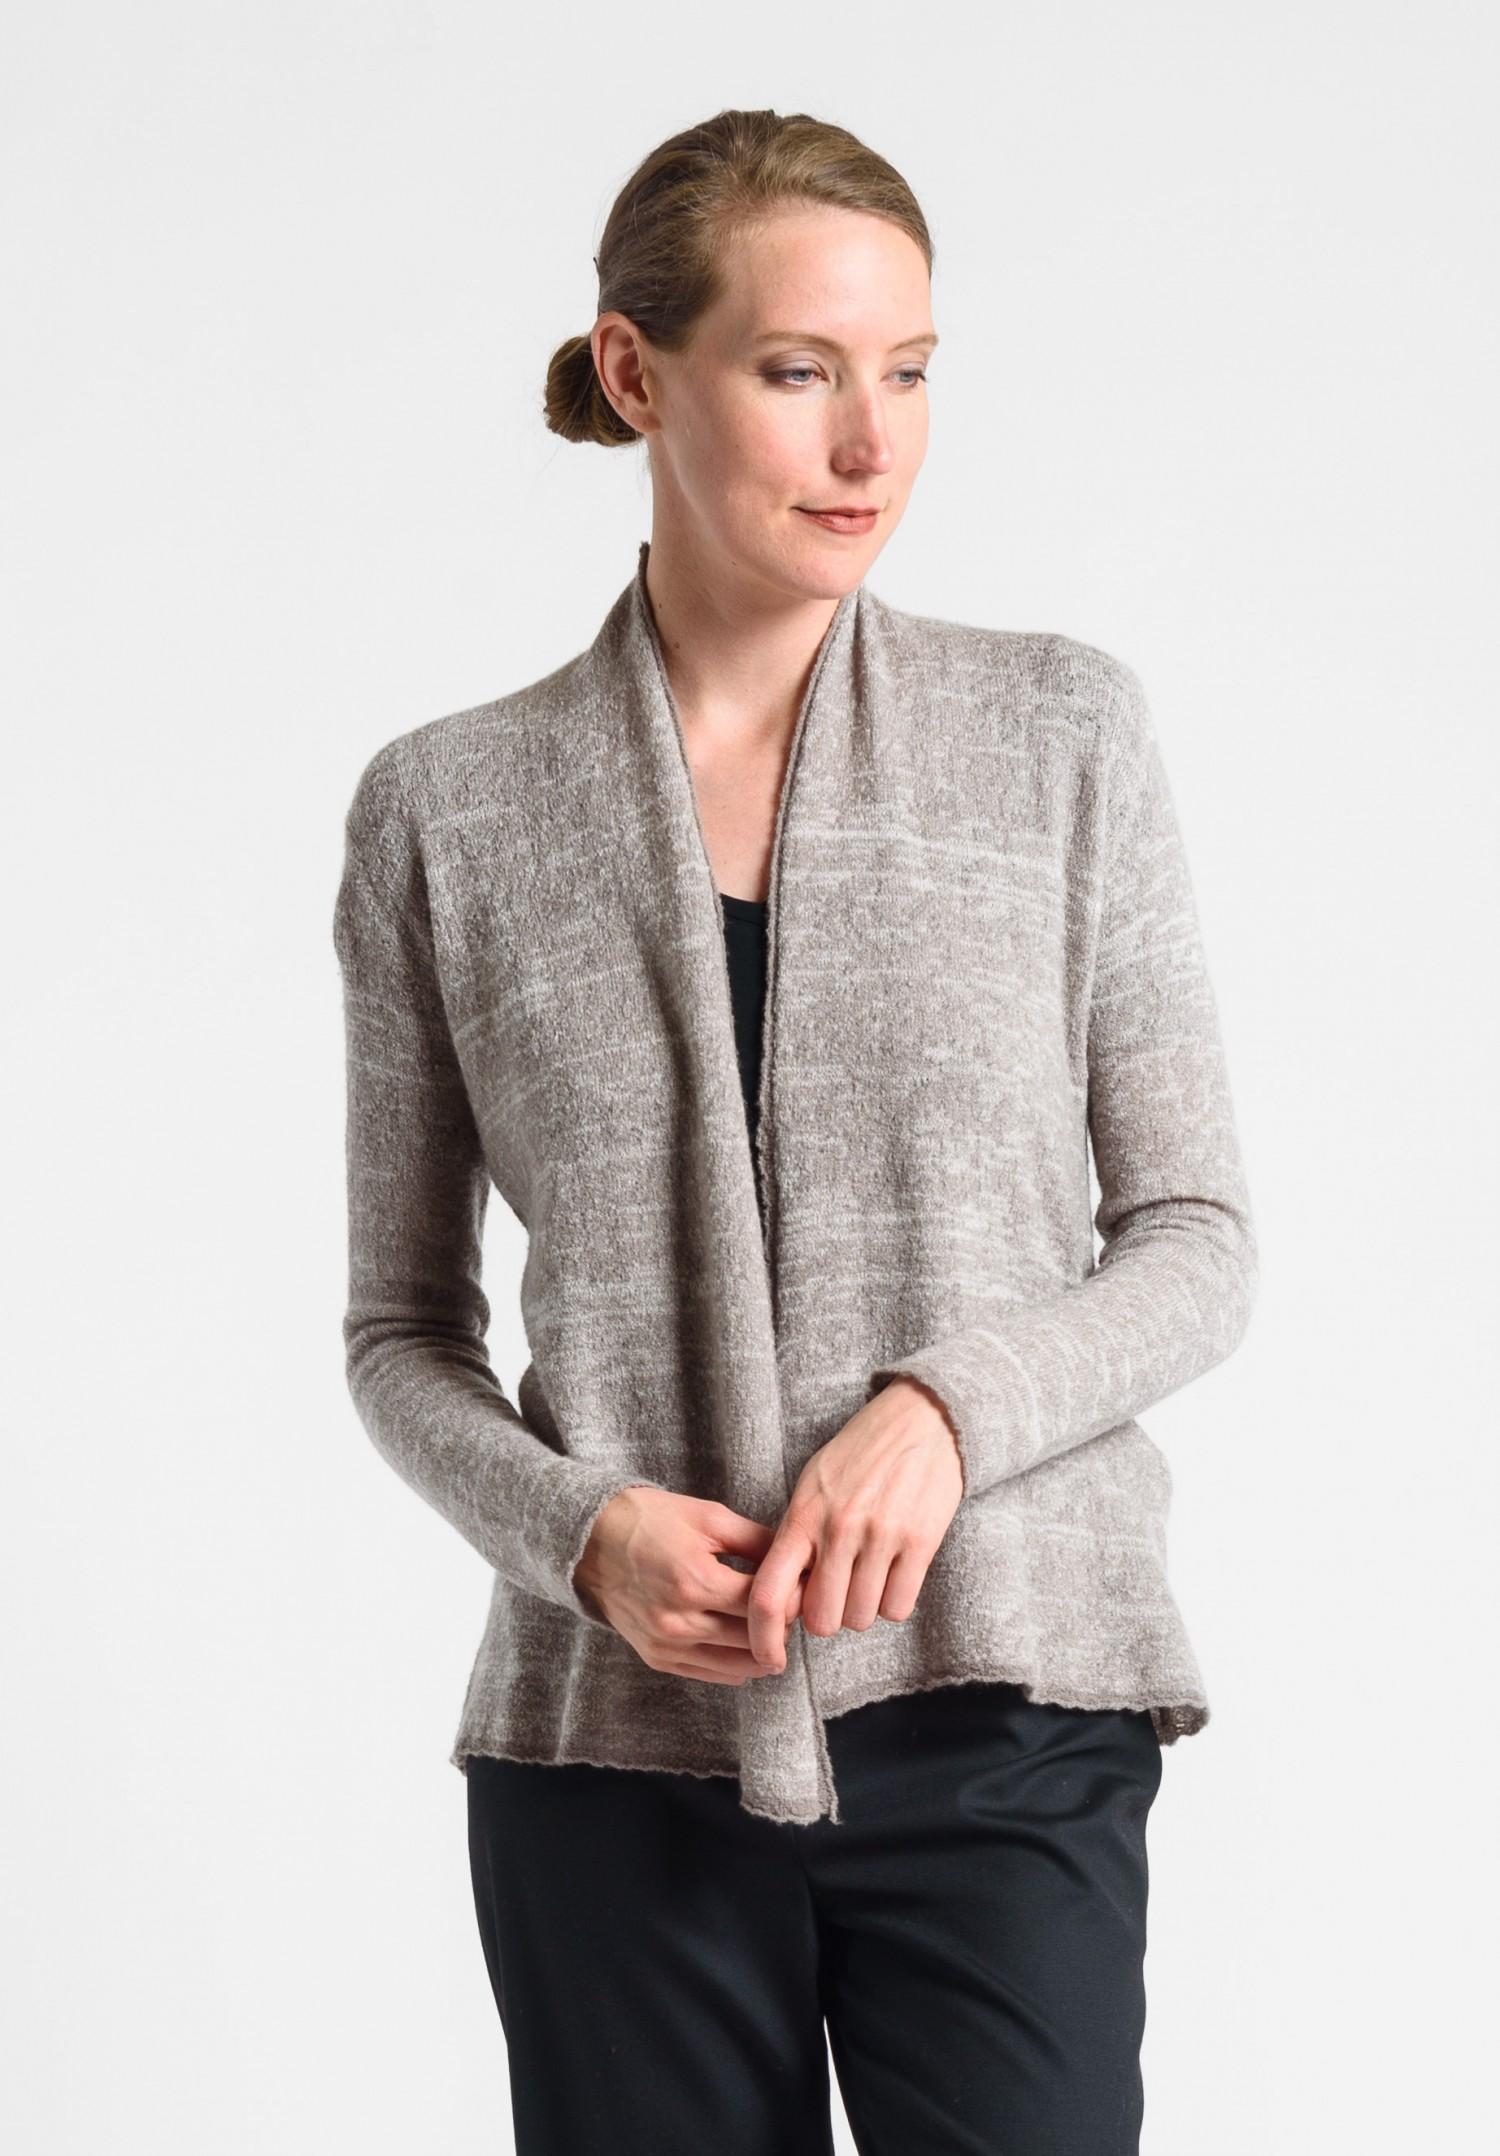 Lainey Lightweight Cashmere Sweater in Light Beige | Santa Fe Dry ...